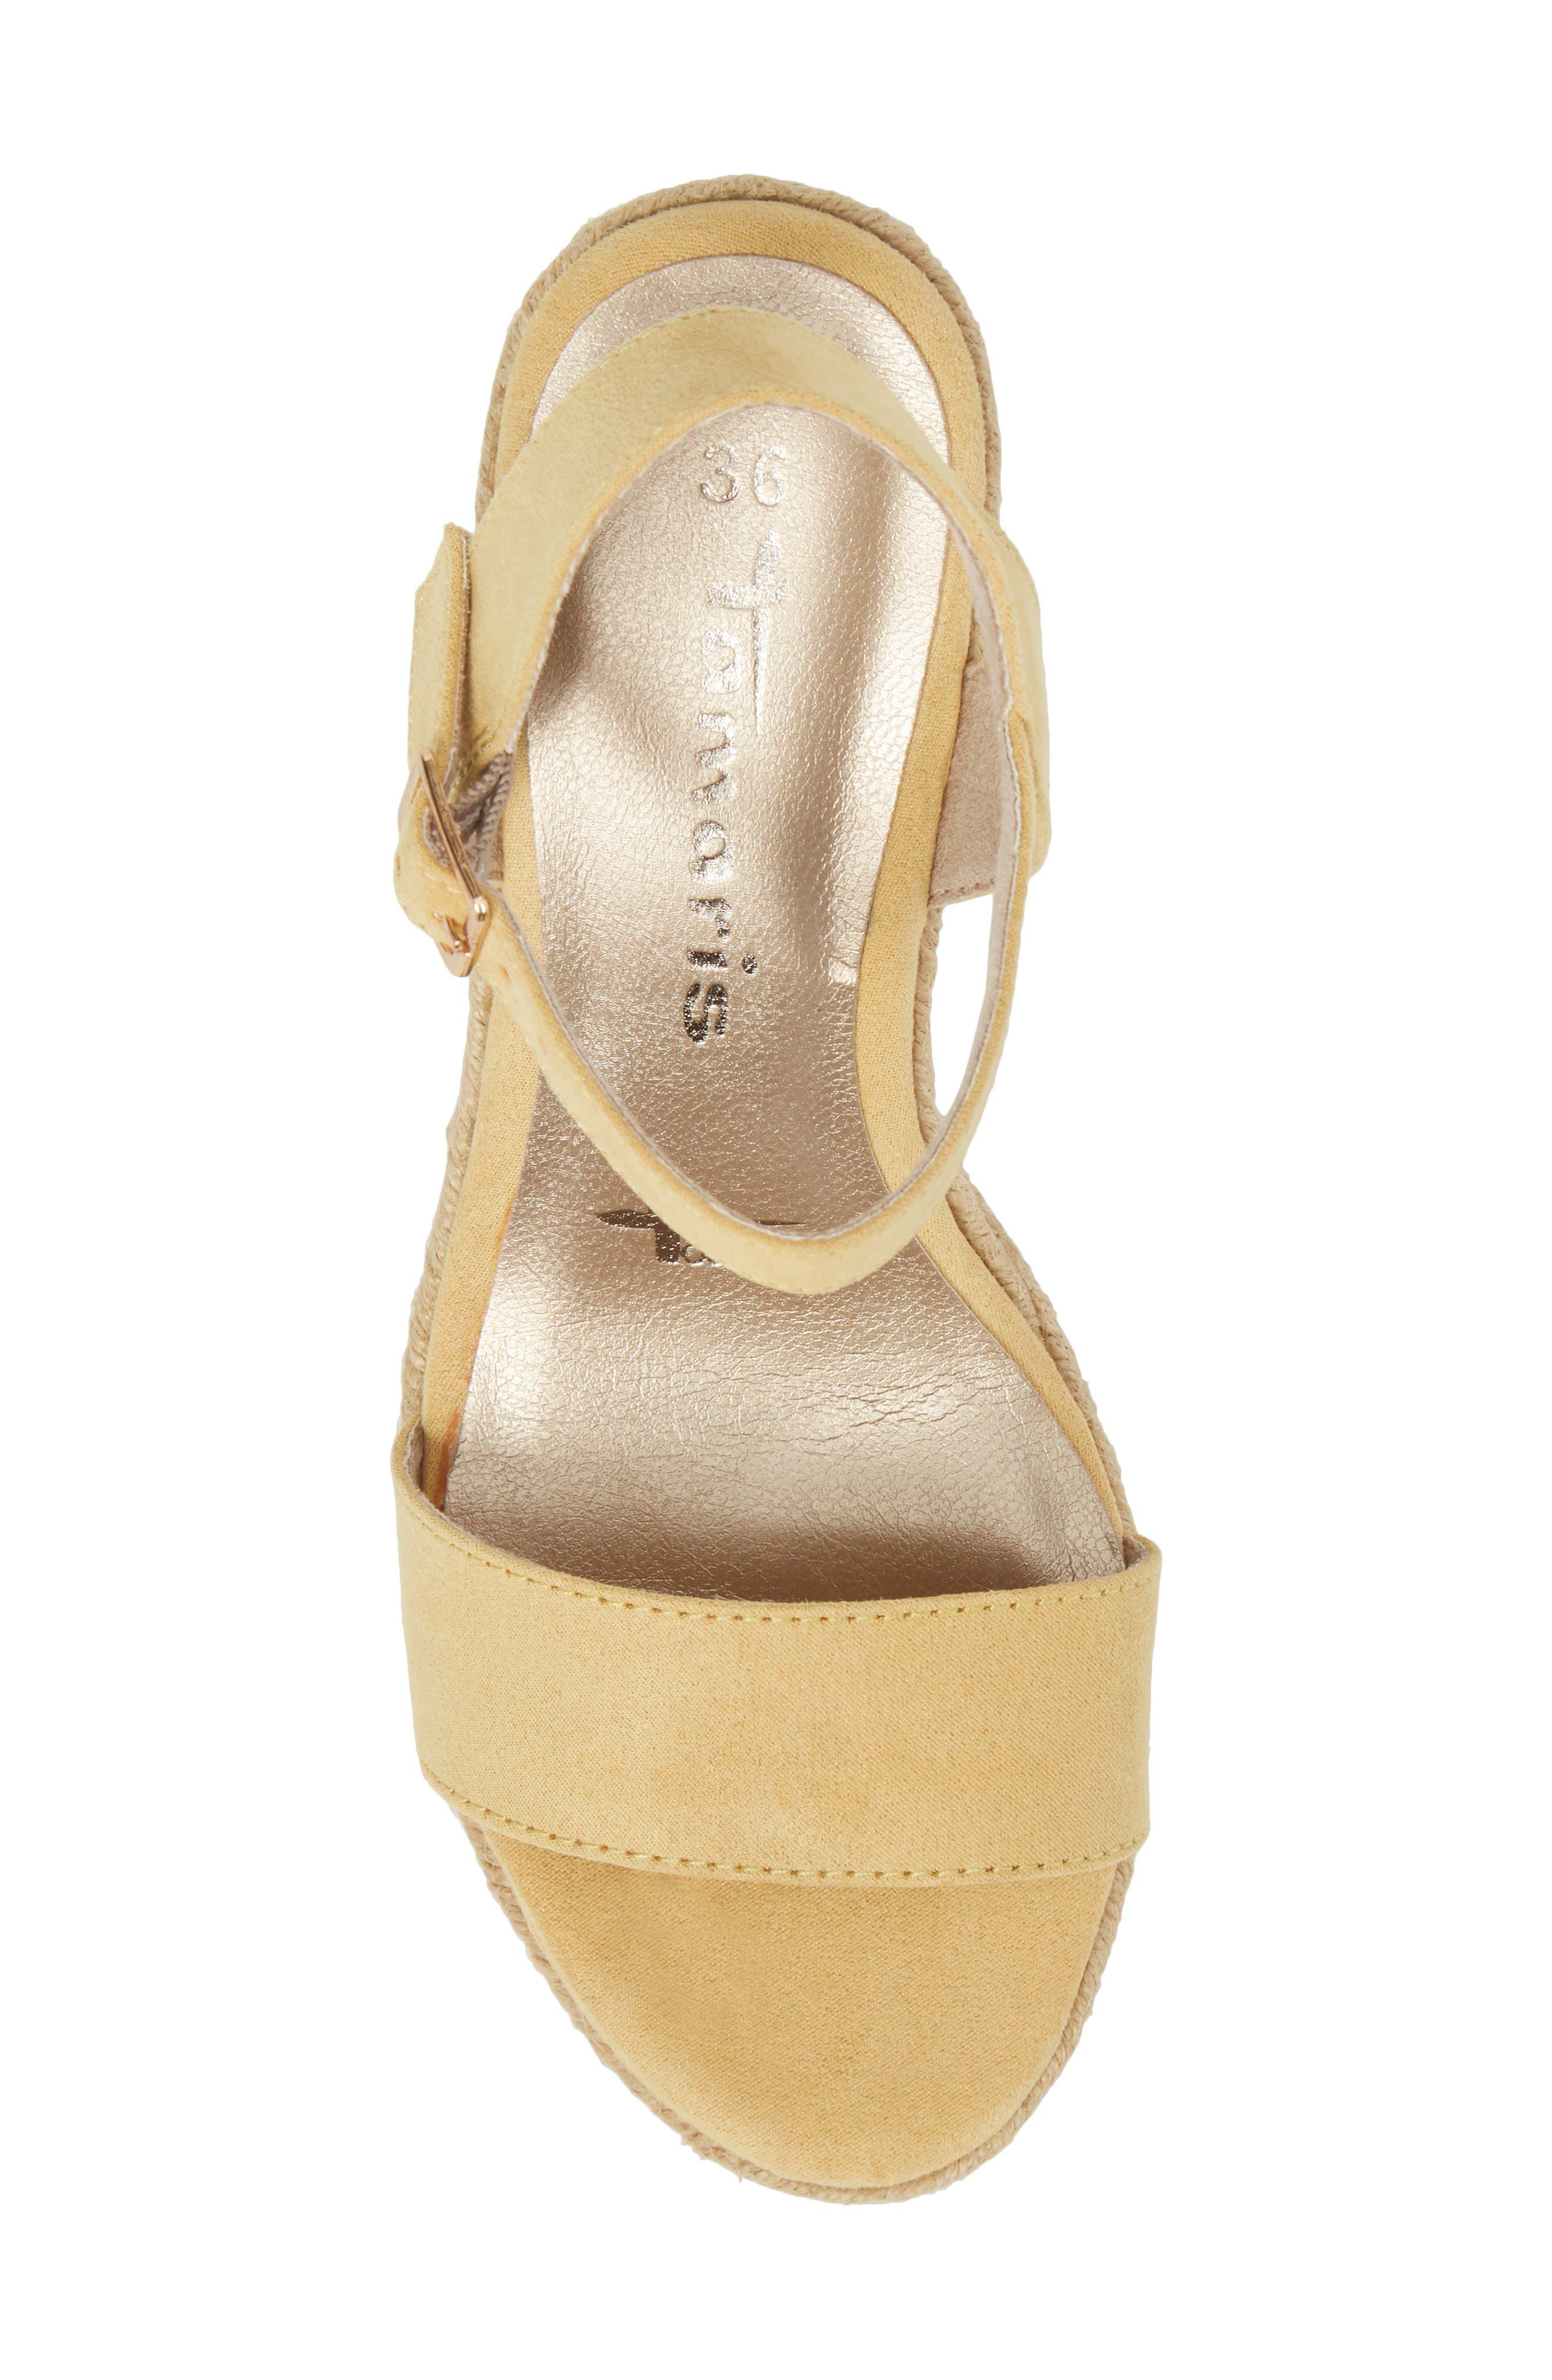 Livia Espadrille Wedge Sandal,                             Alternate thumbnail 5, color,                             Saffron Fabric